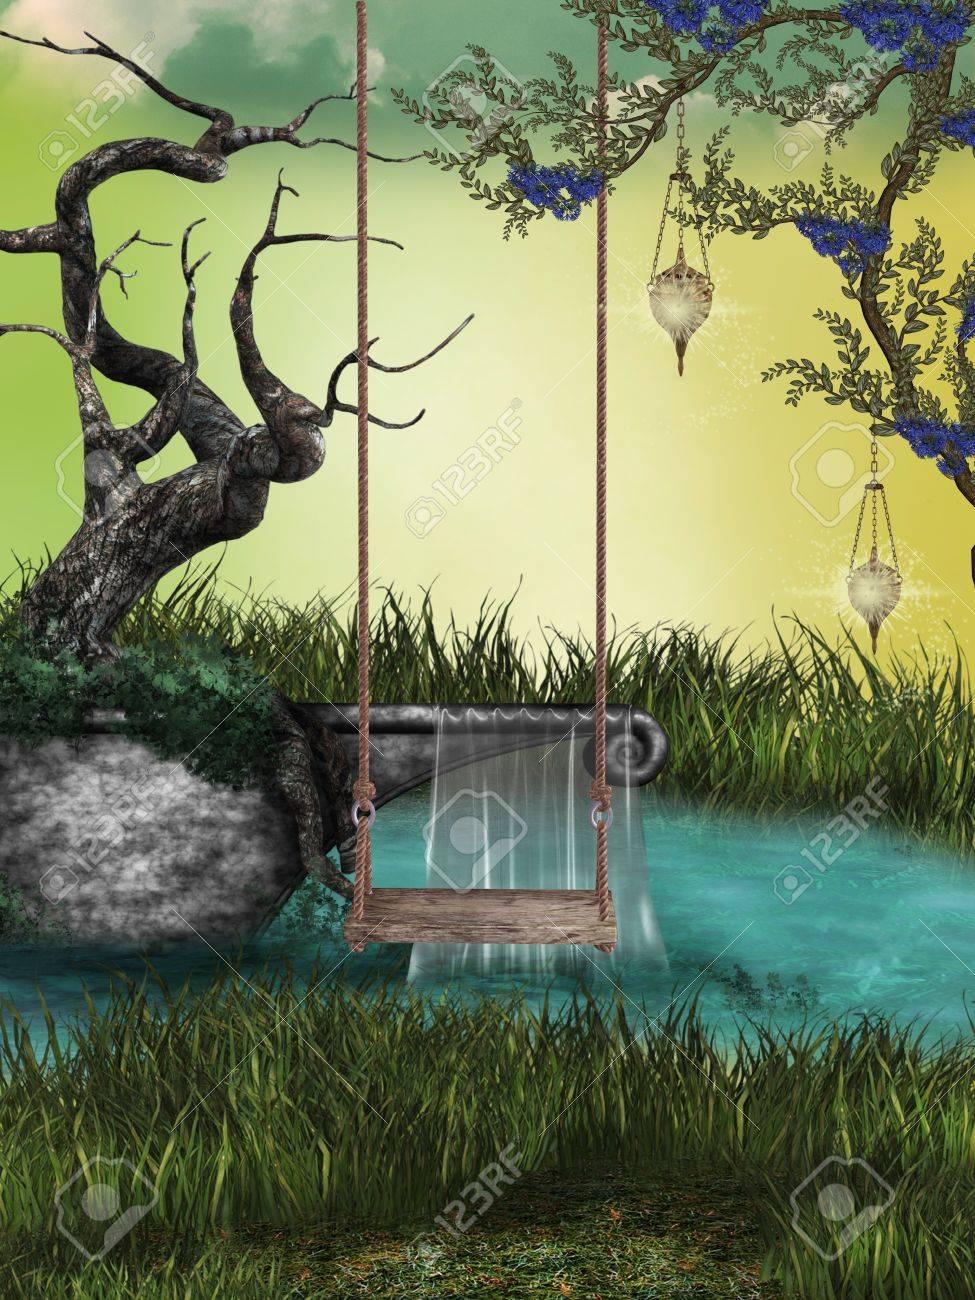 Fantasy Landscape with hammock and small lake Stock Photo - 11450520